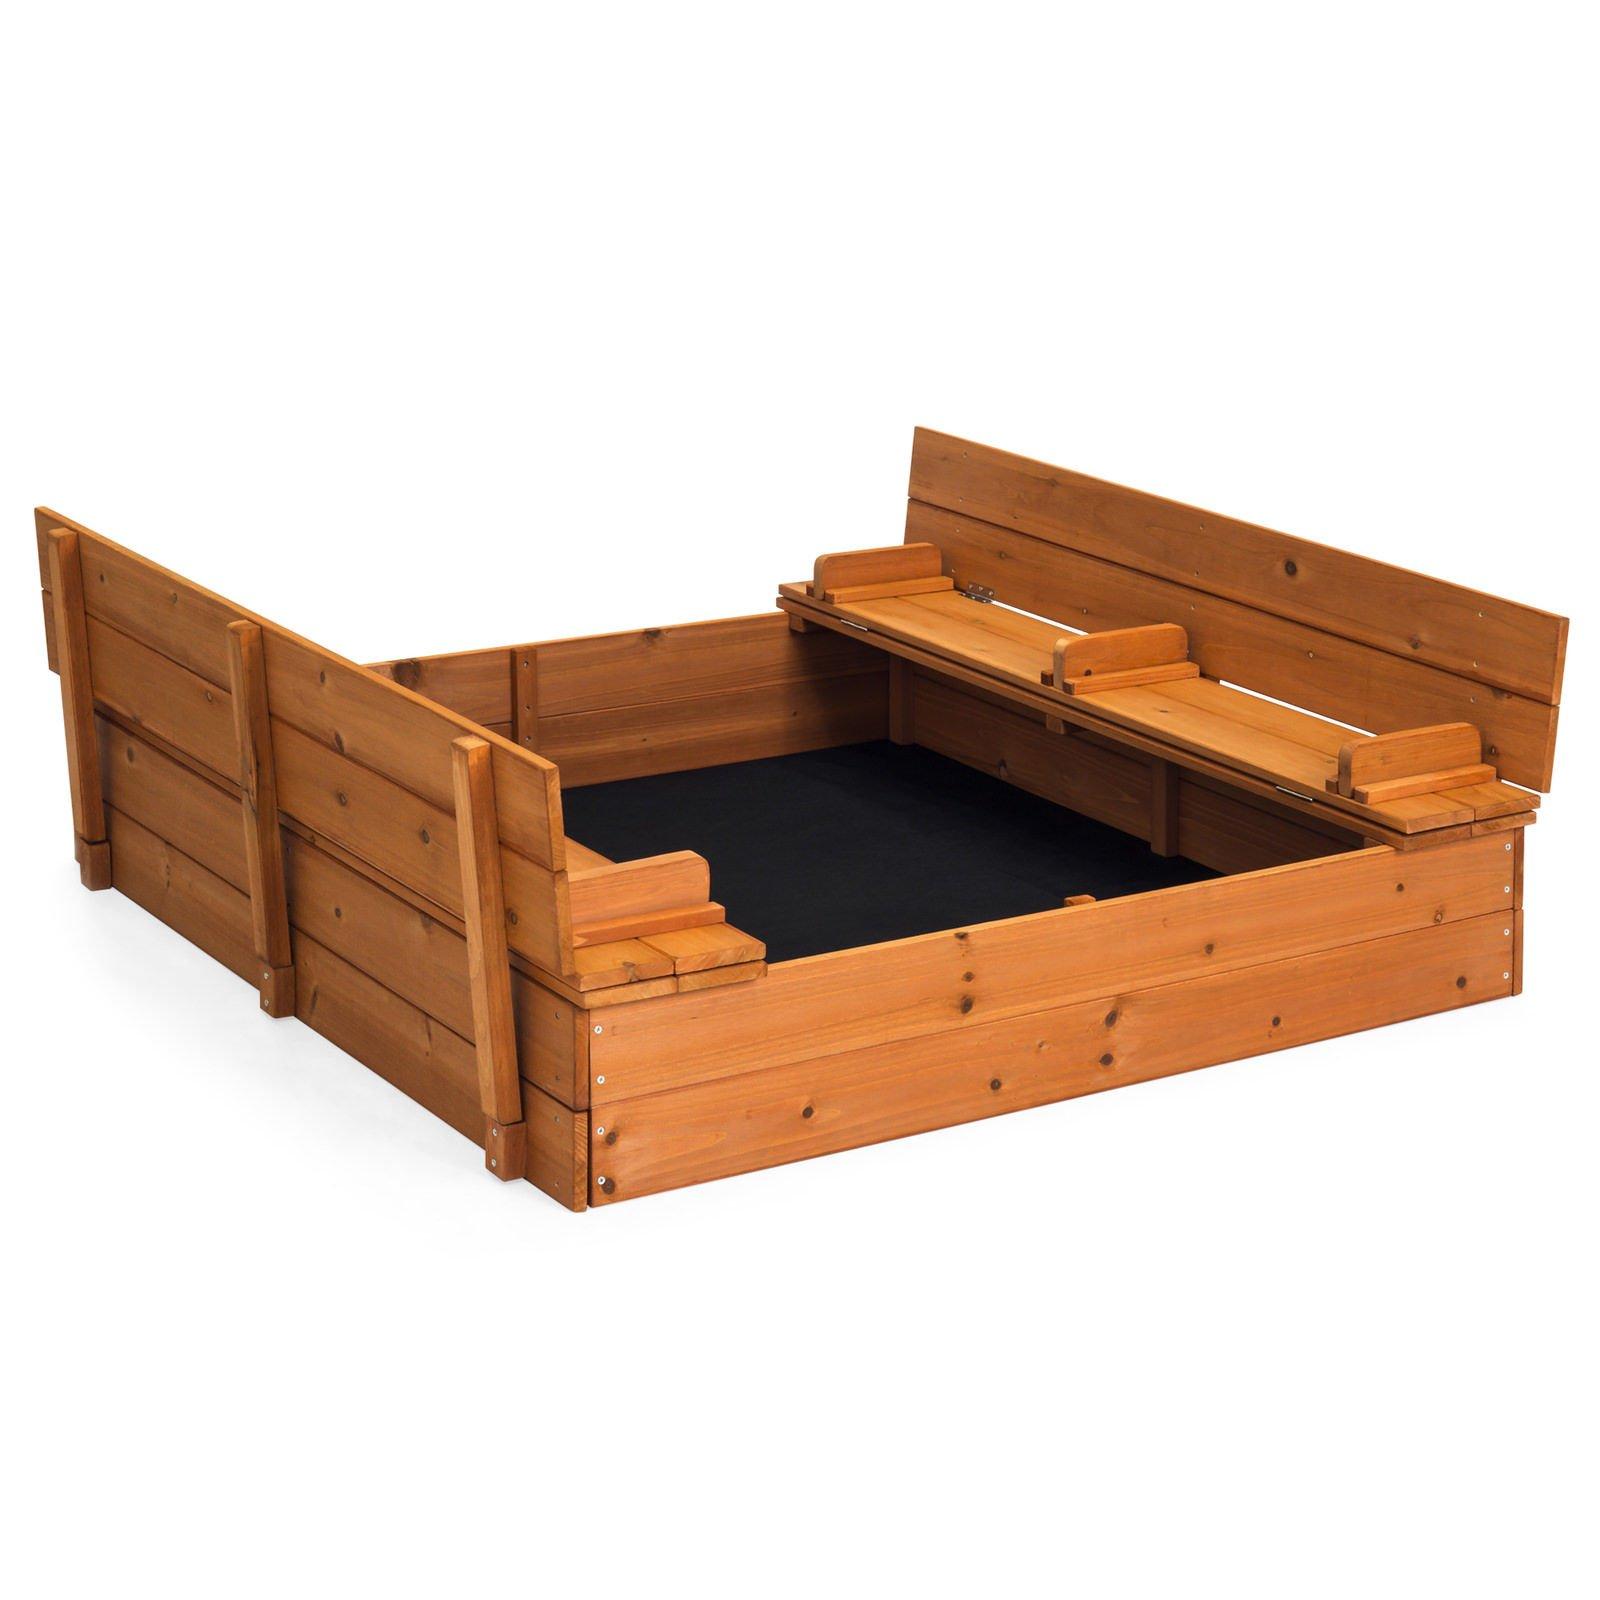 Marketworldcup- 47x47in Large Cedar Sandbox w/2 Bench Seats